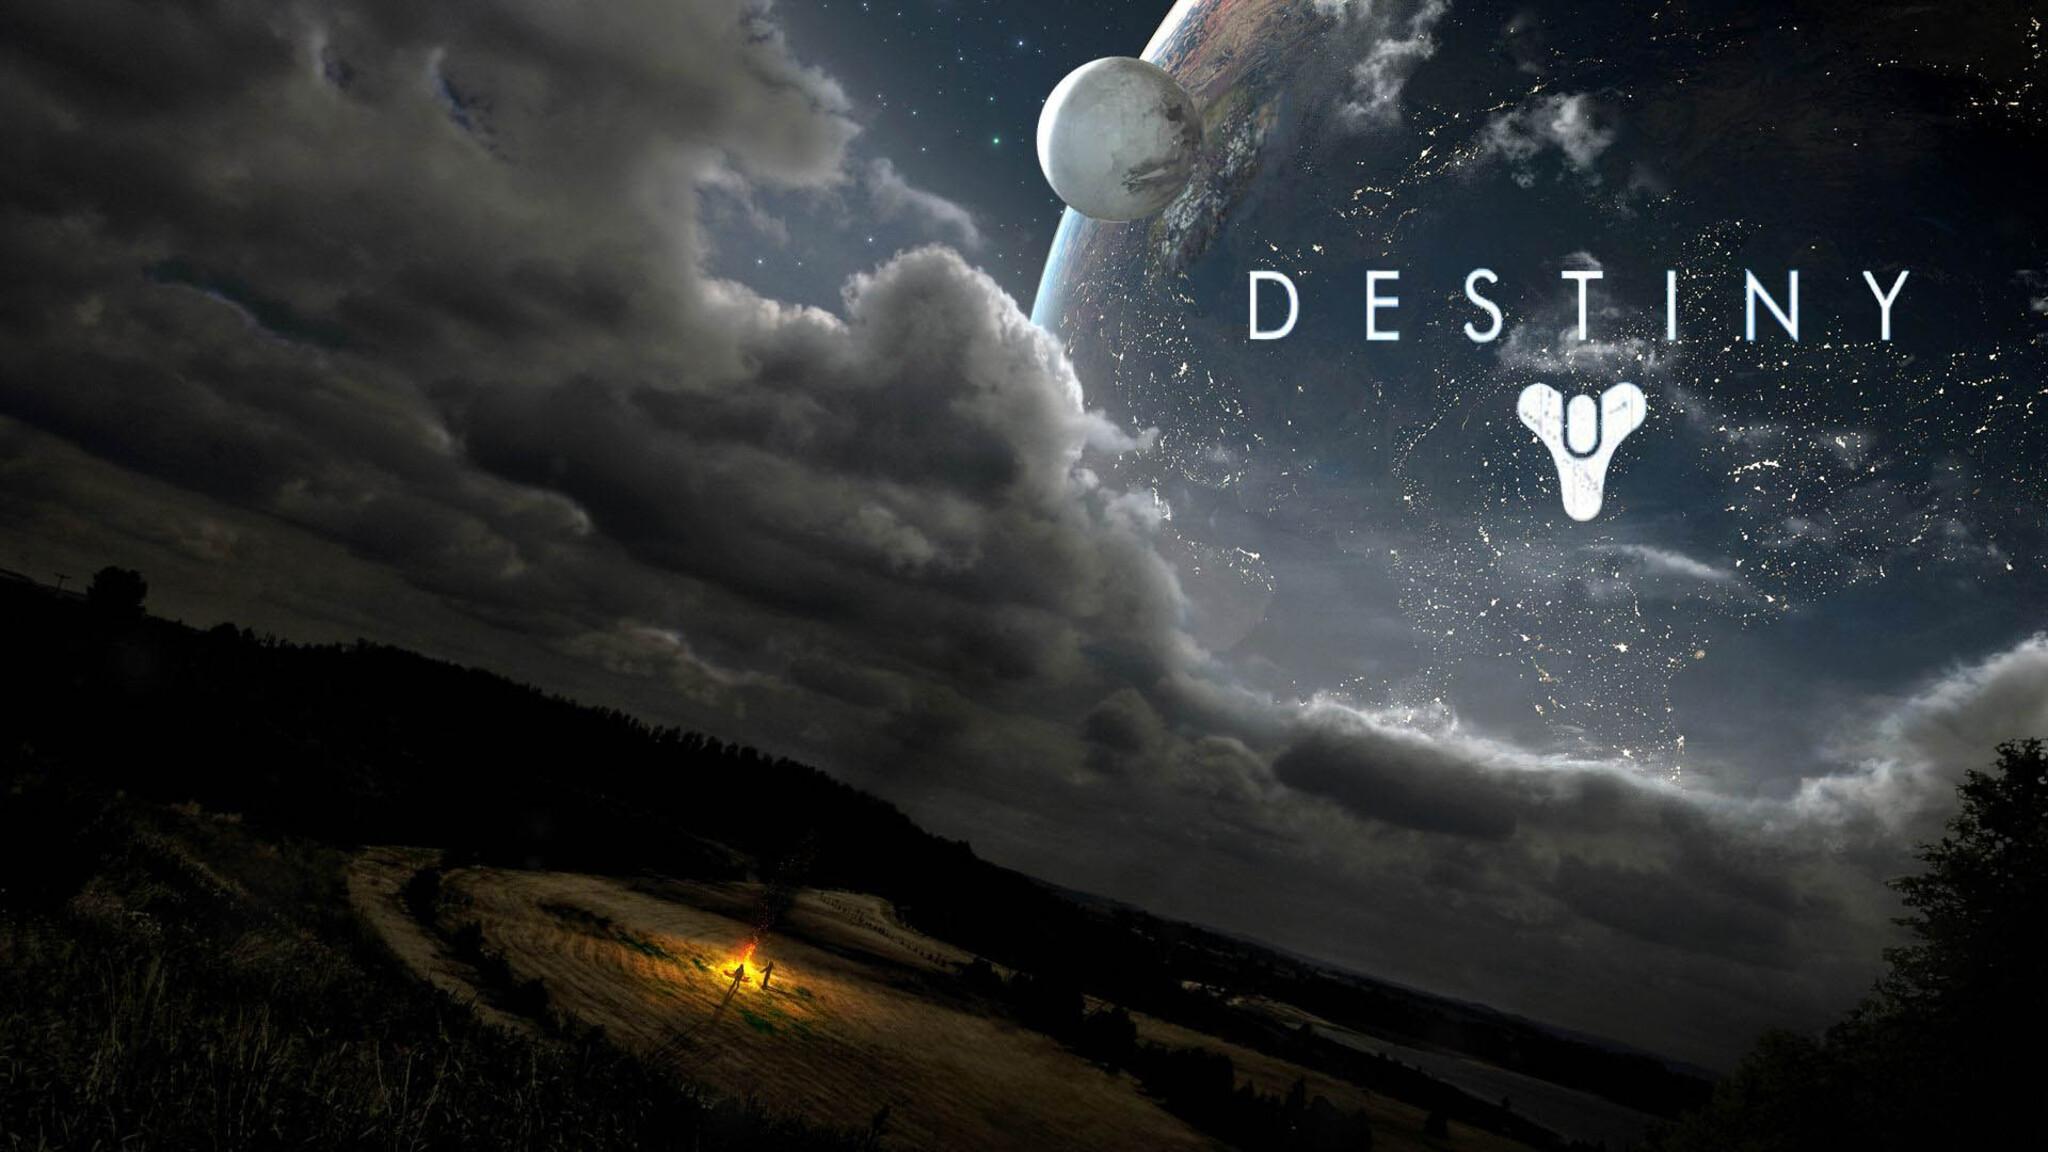 download destiny game hd - photo #19